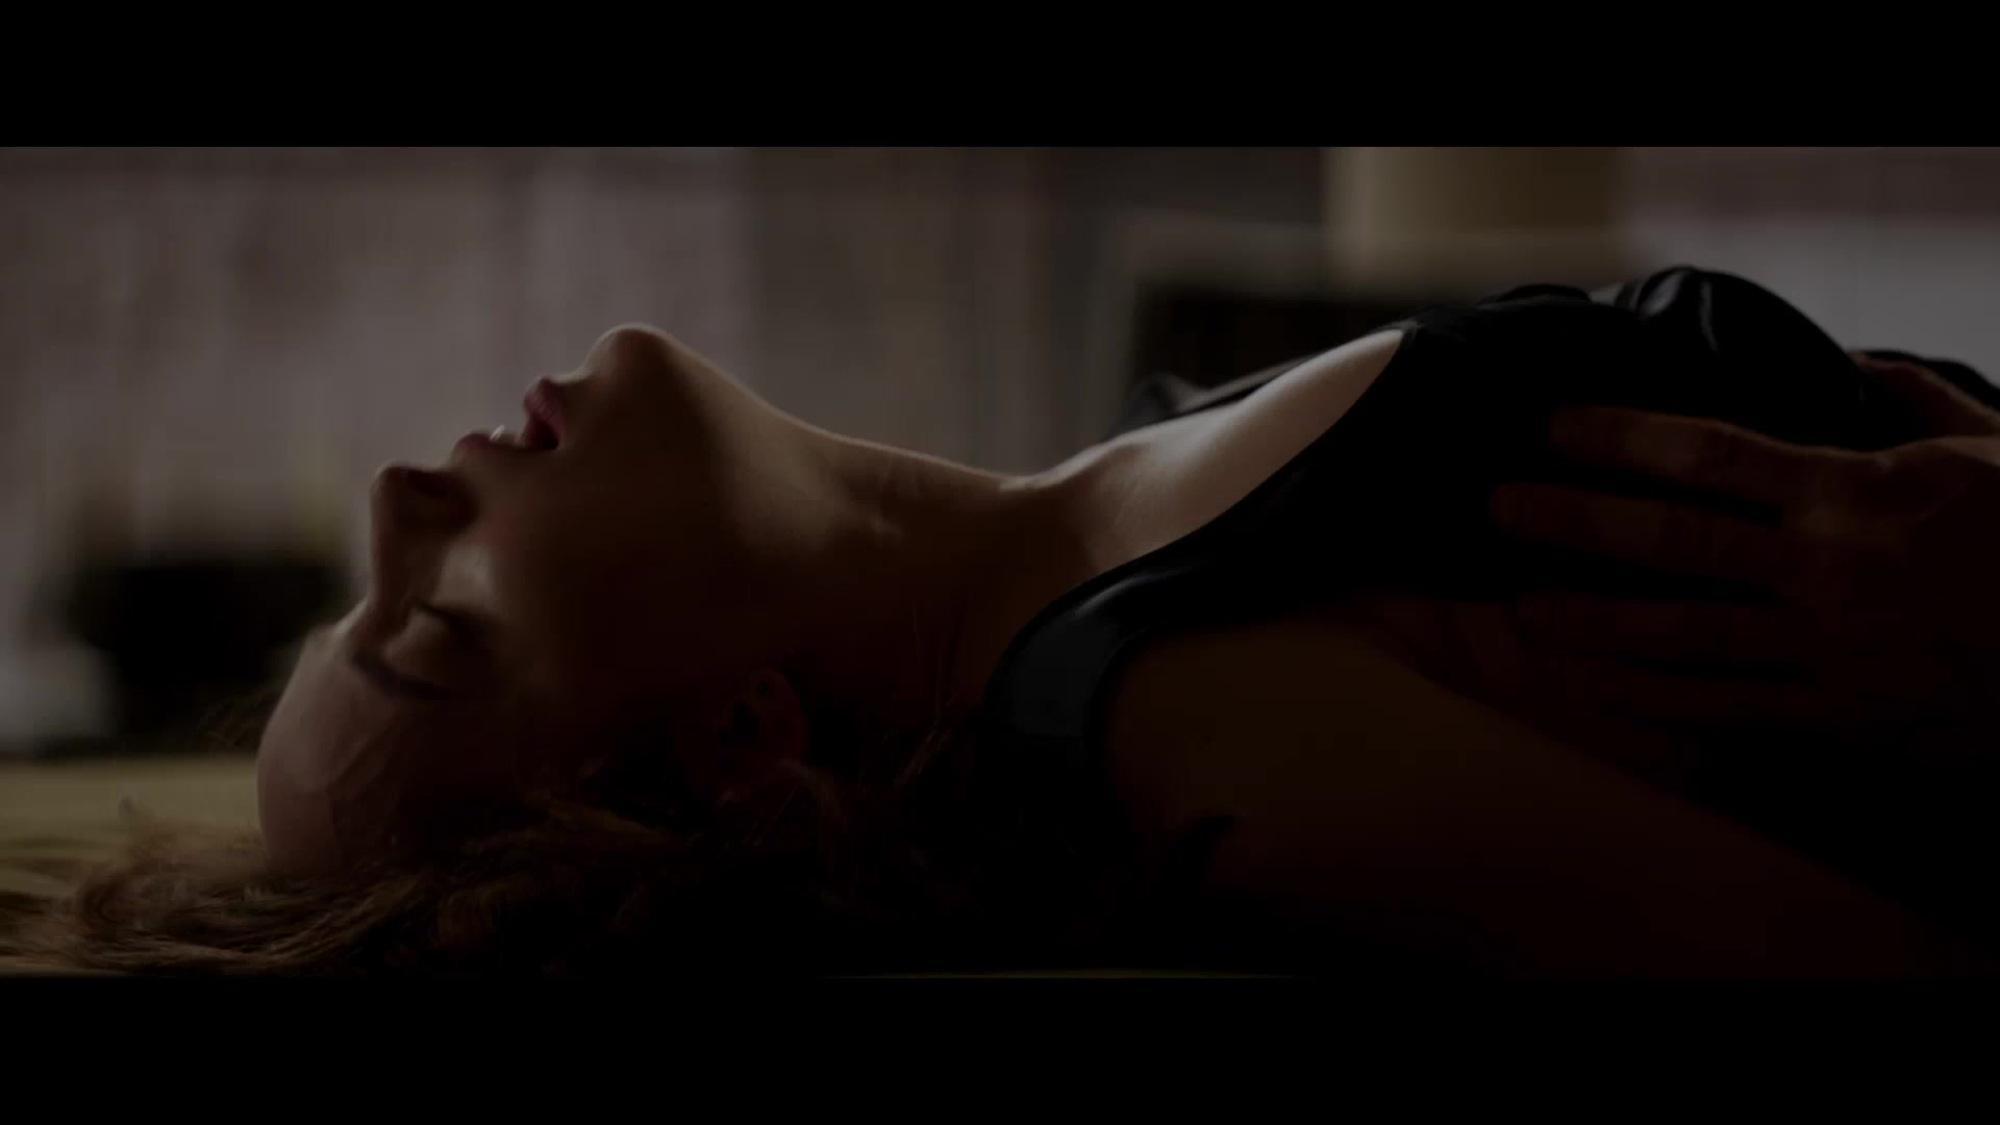 eros erotico scene erotiche da film